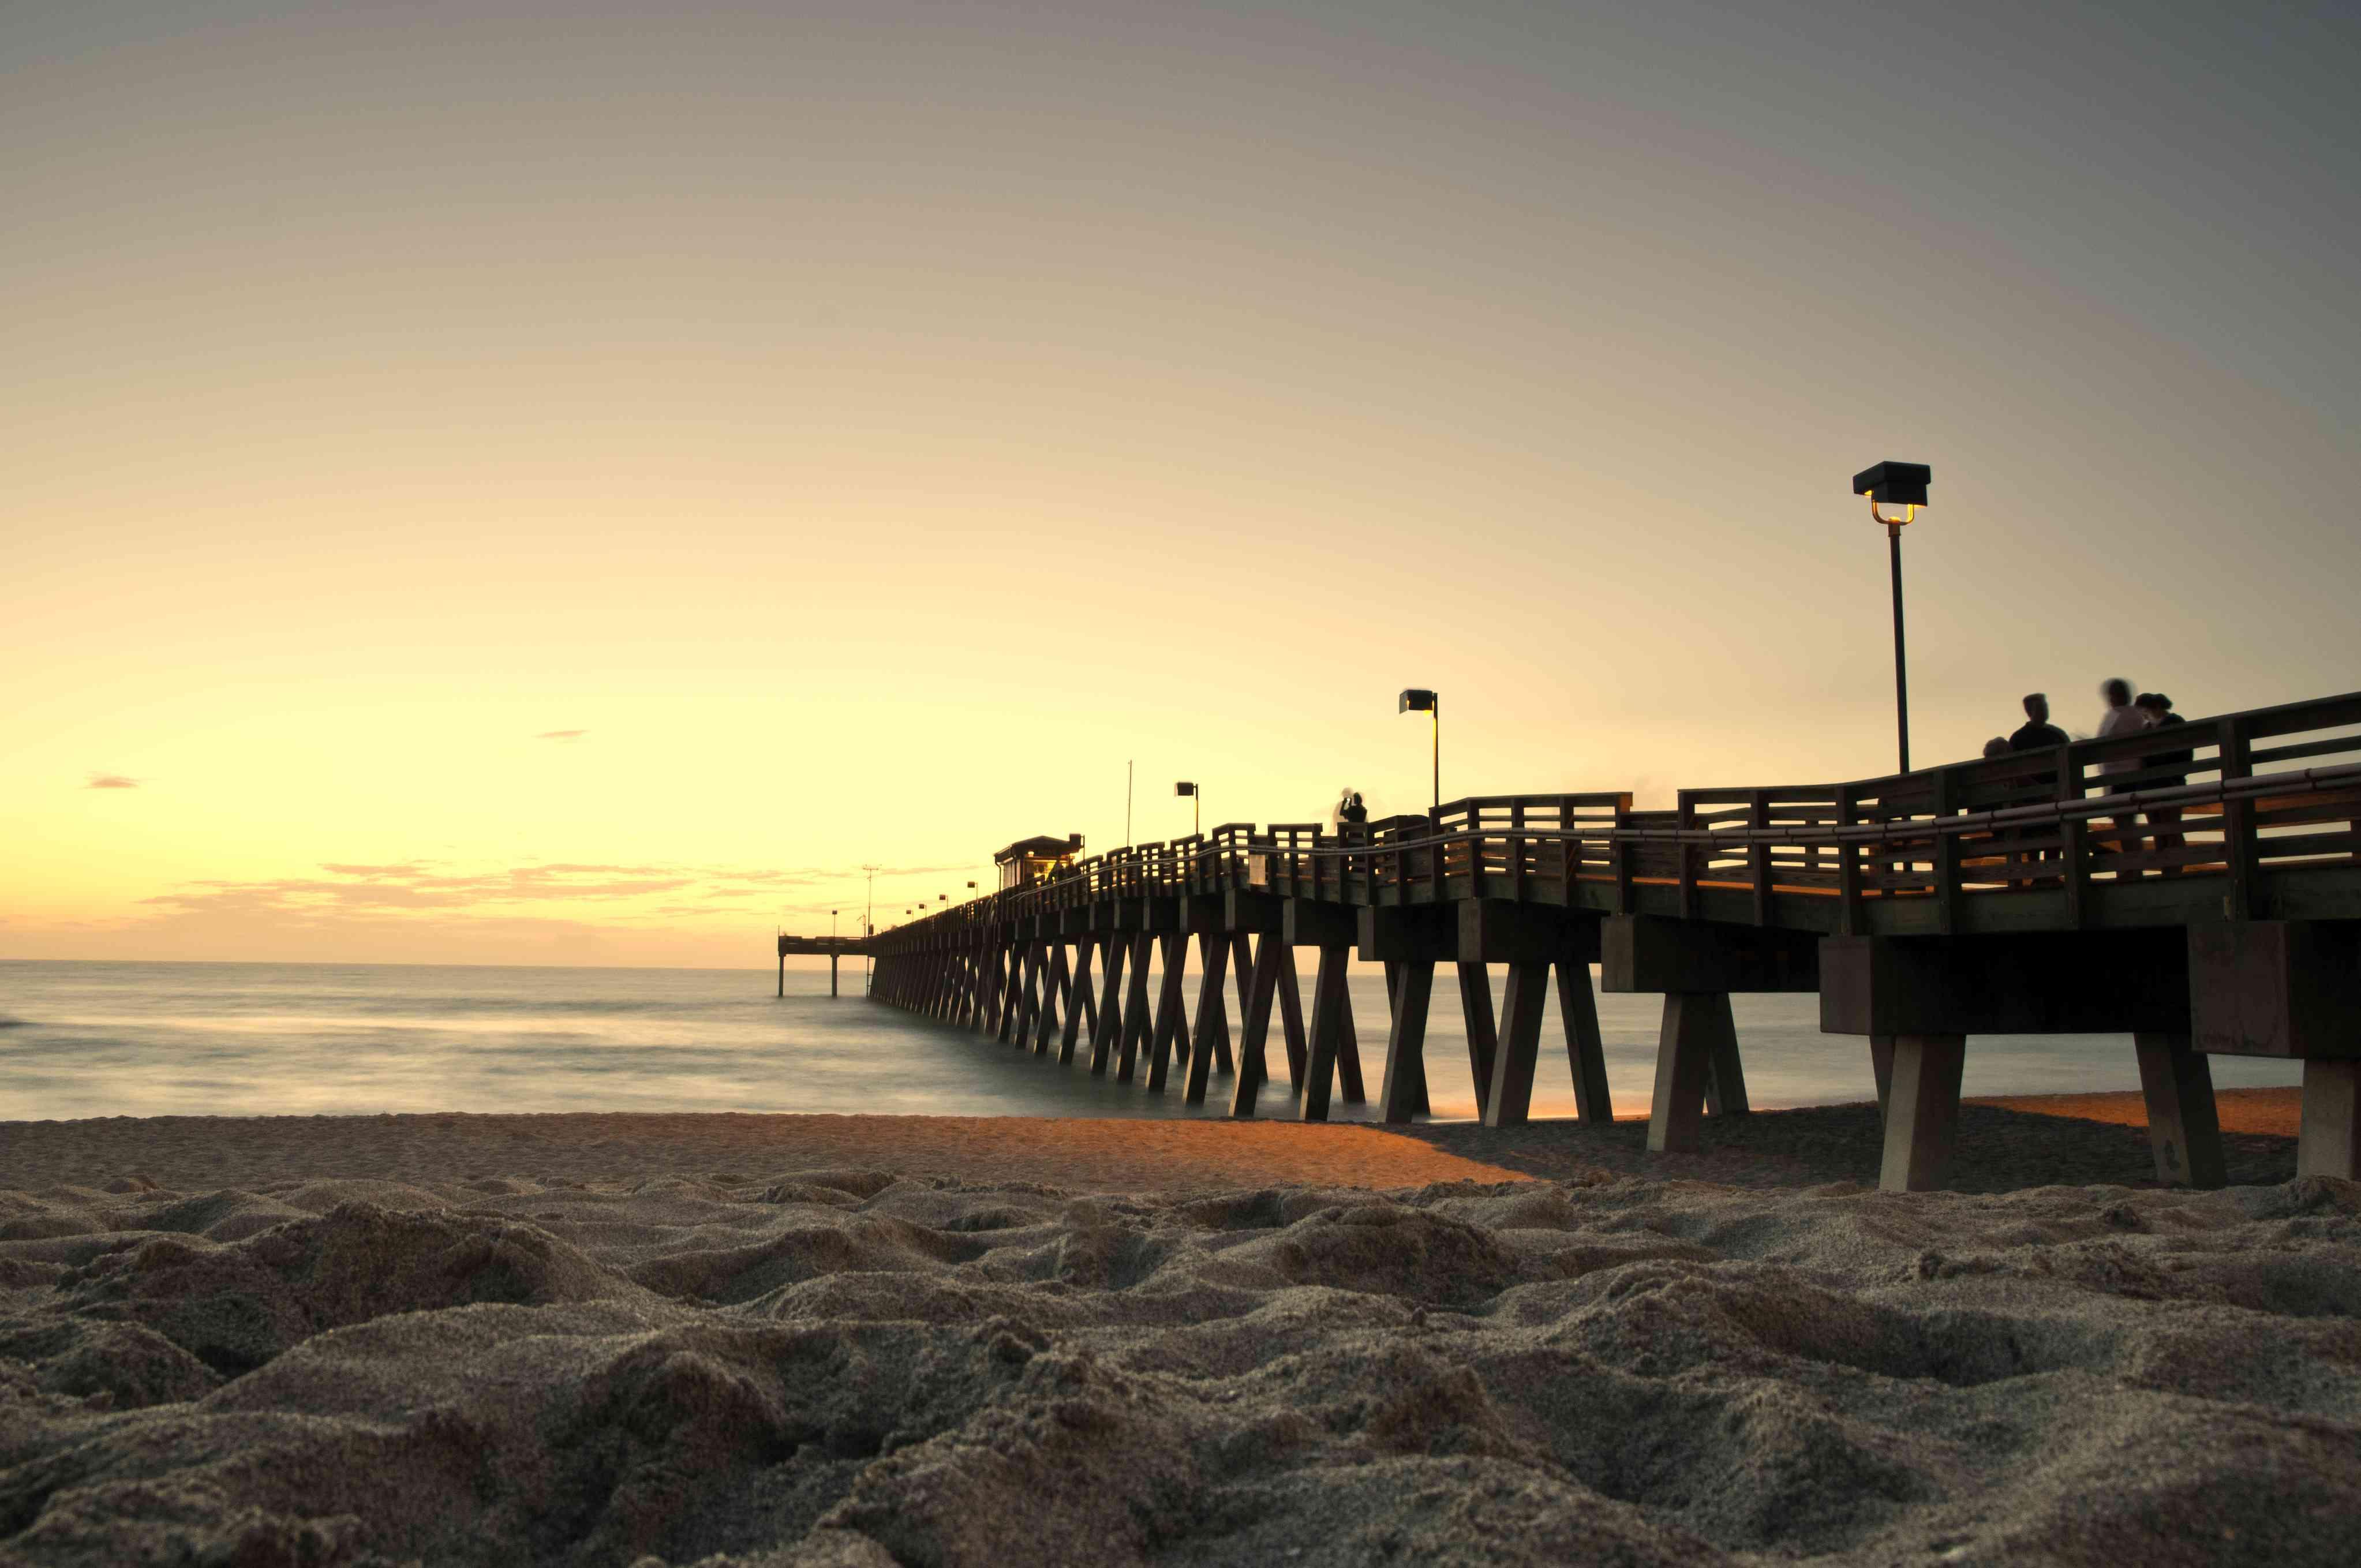 Sunset Pier On Venice Beach, FL